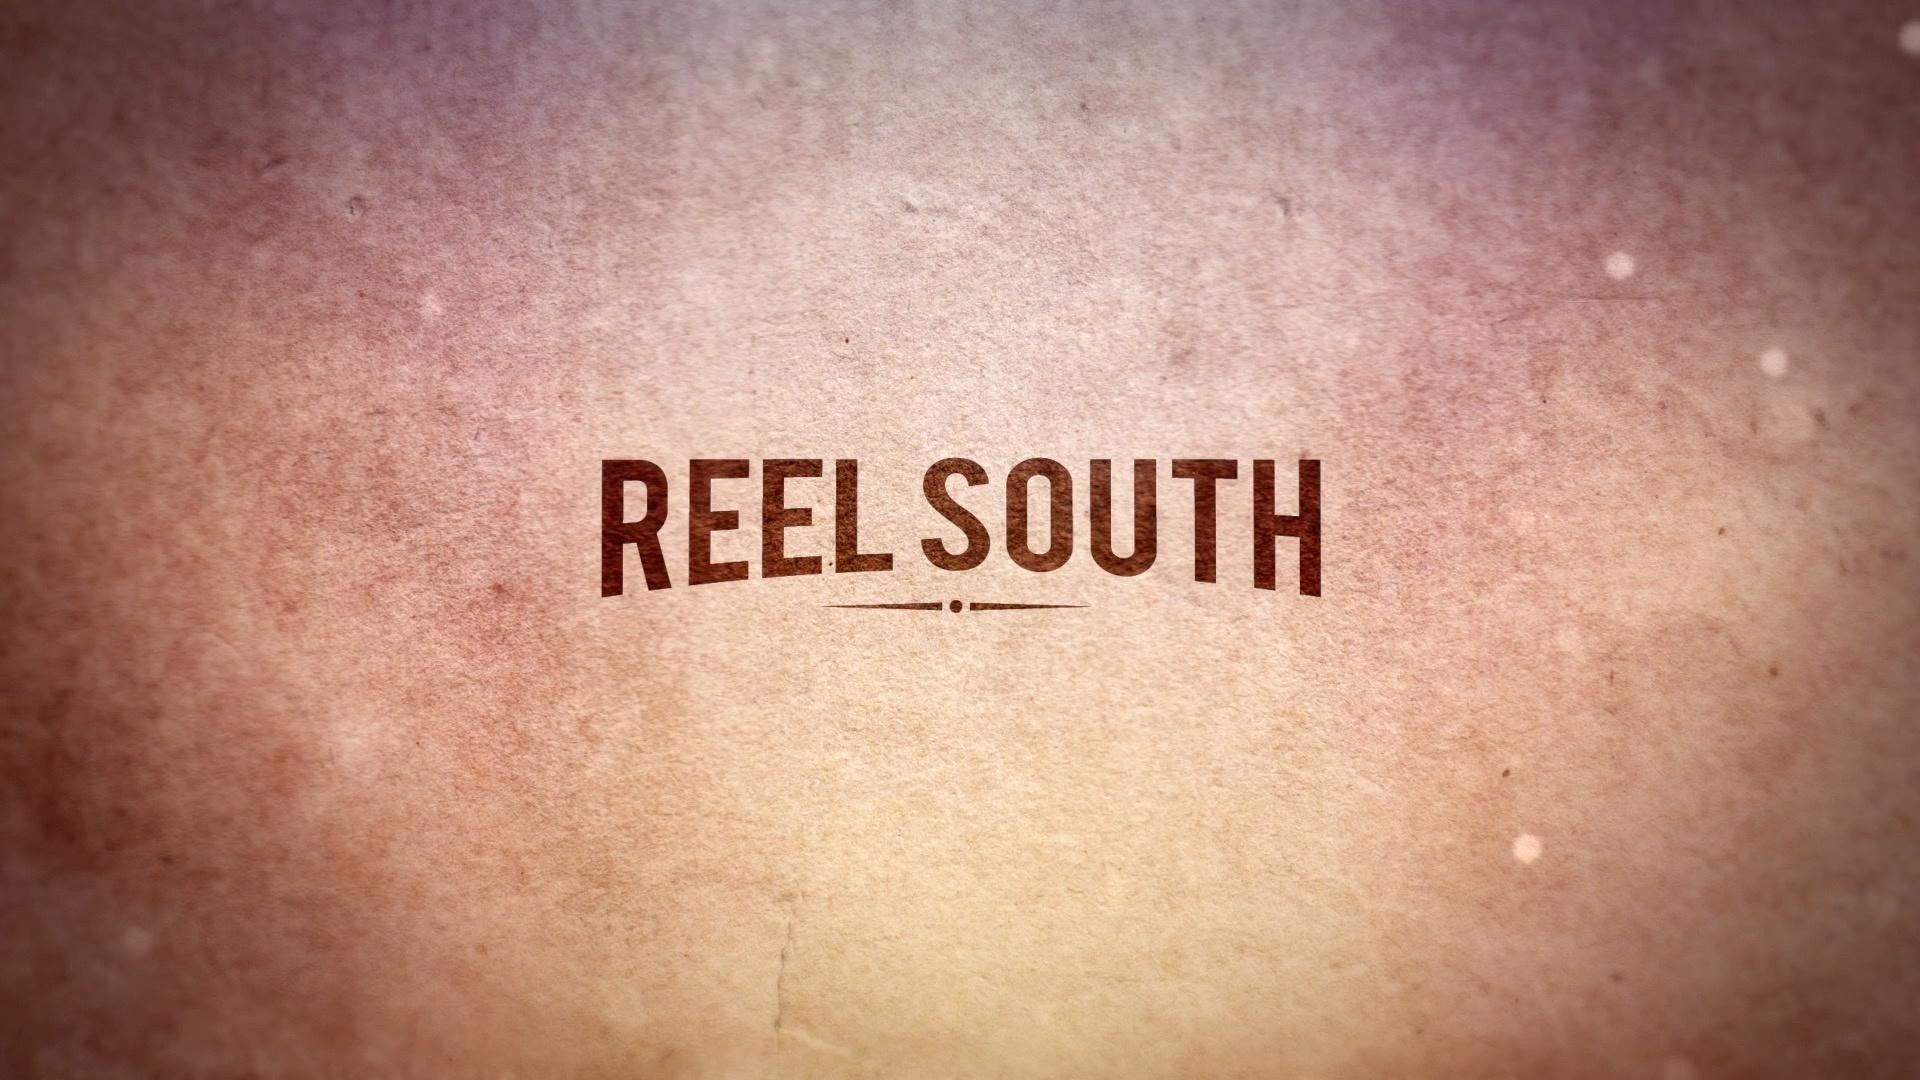 REEL SOUTH 2nd Season: Promo